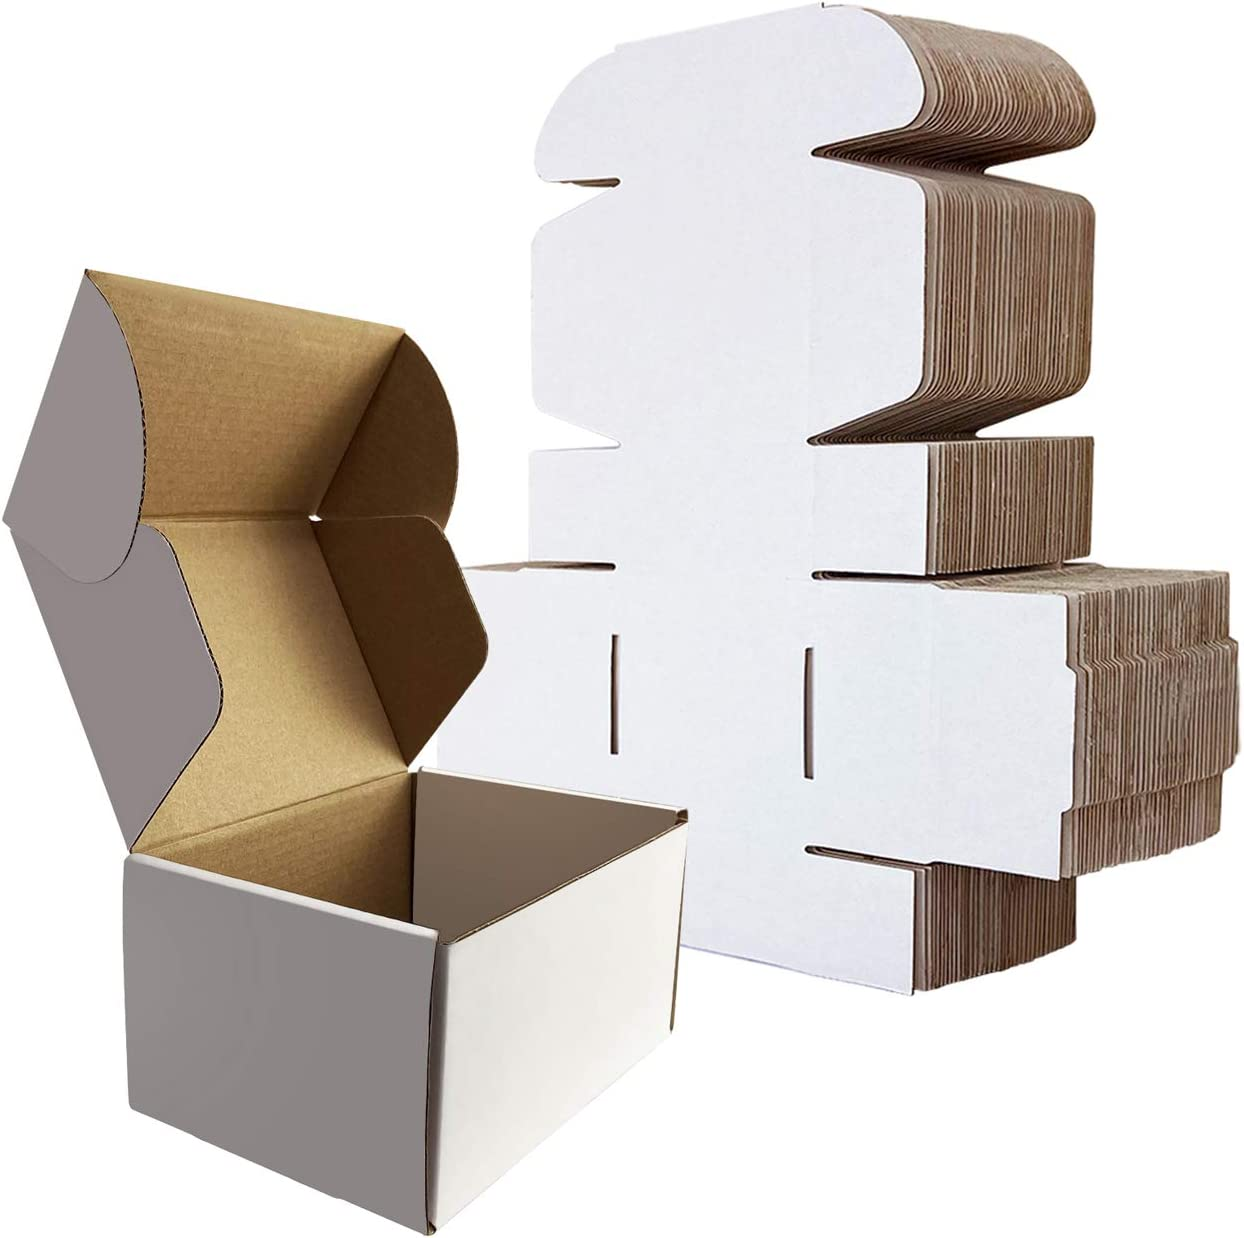 RLAVBL Small Shipping Sale SALE% OFF Boxes 6x4x3 Cardboard Box Corrugated White Max 86% OFF